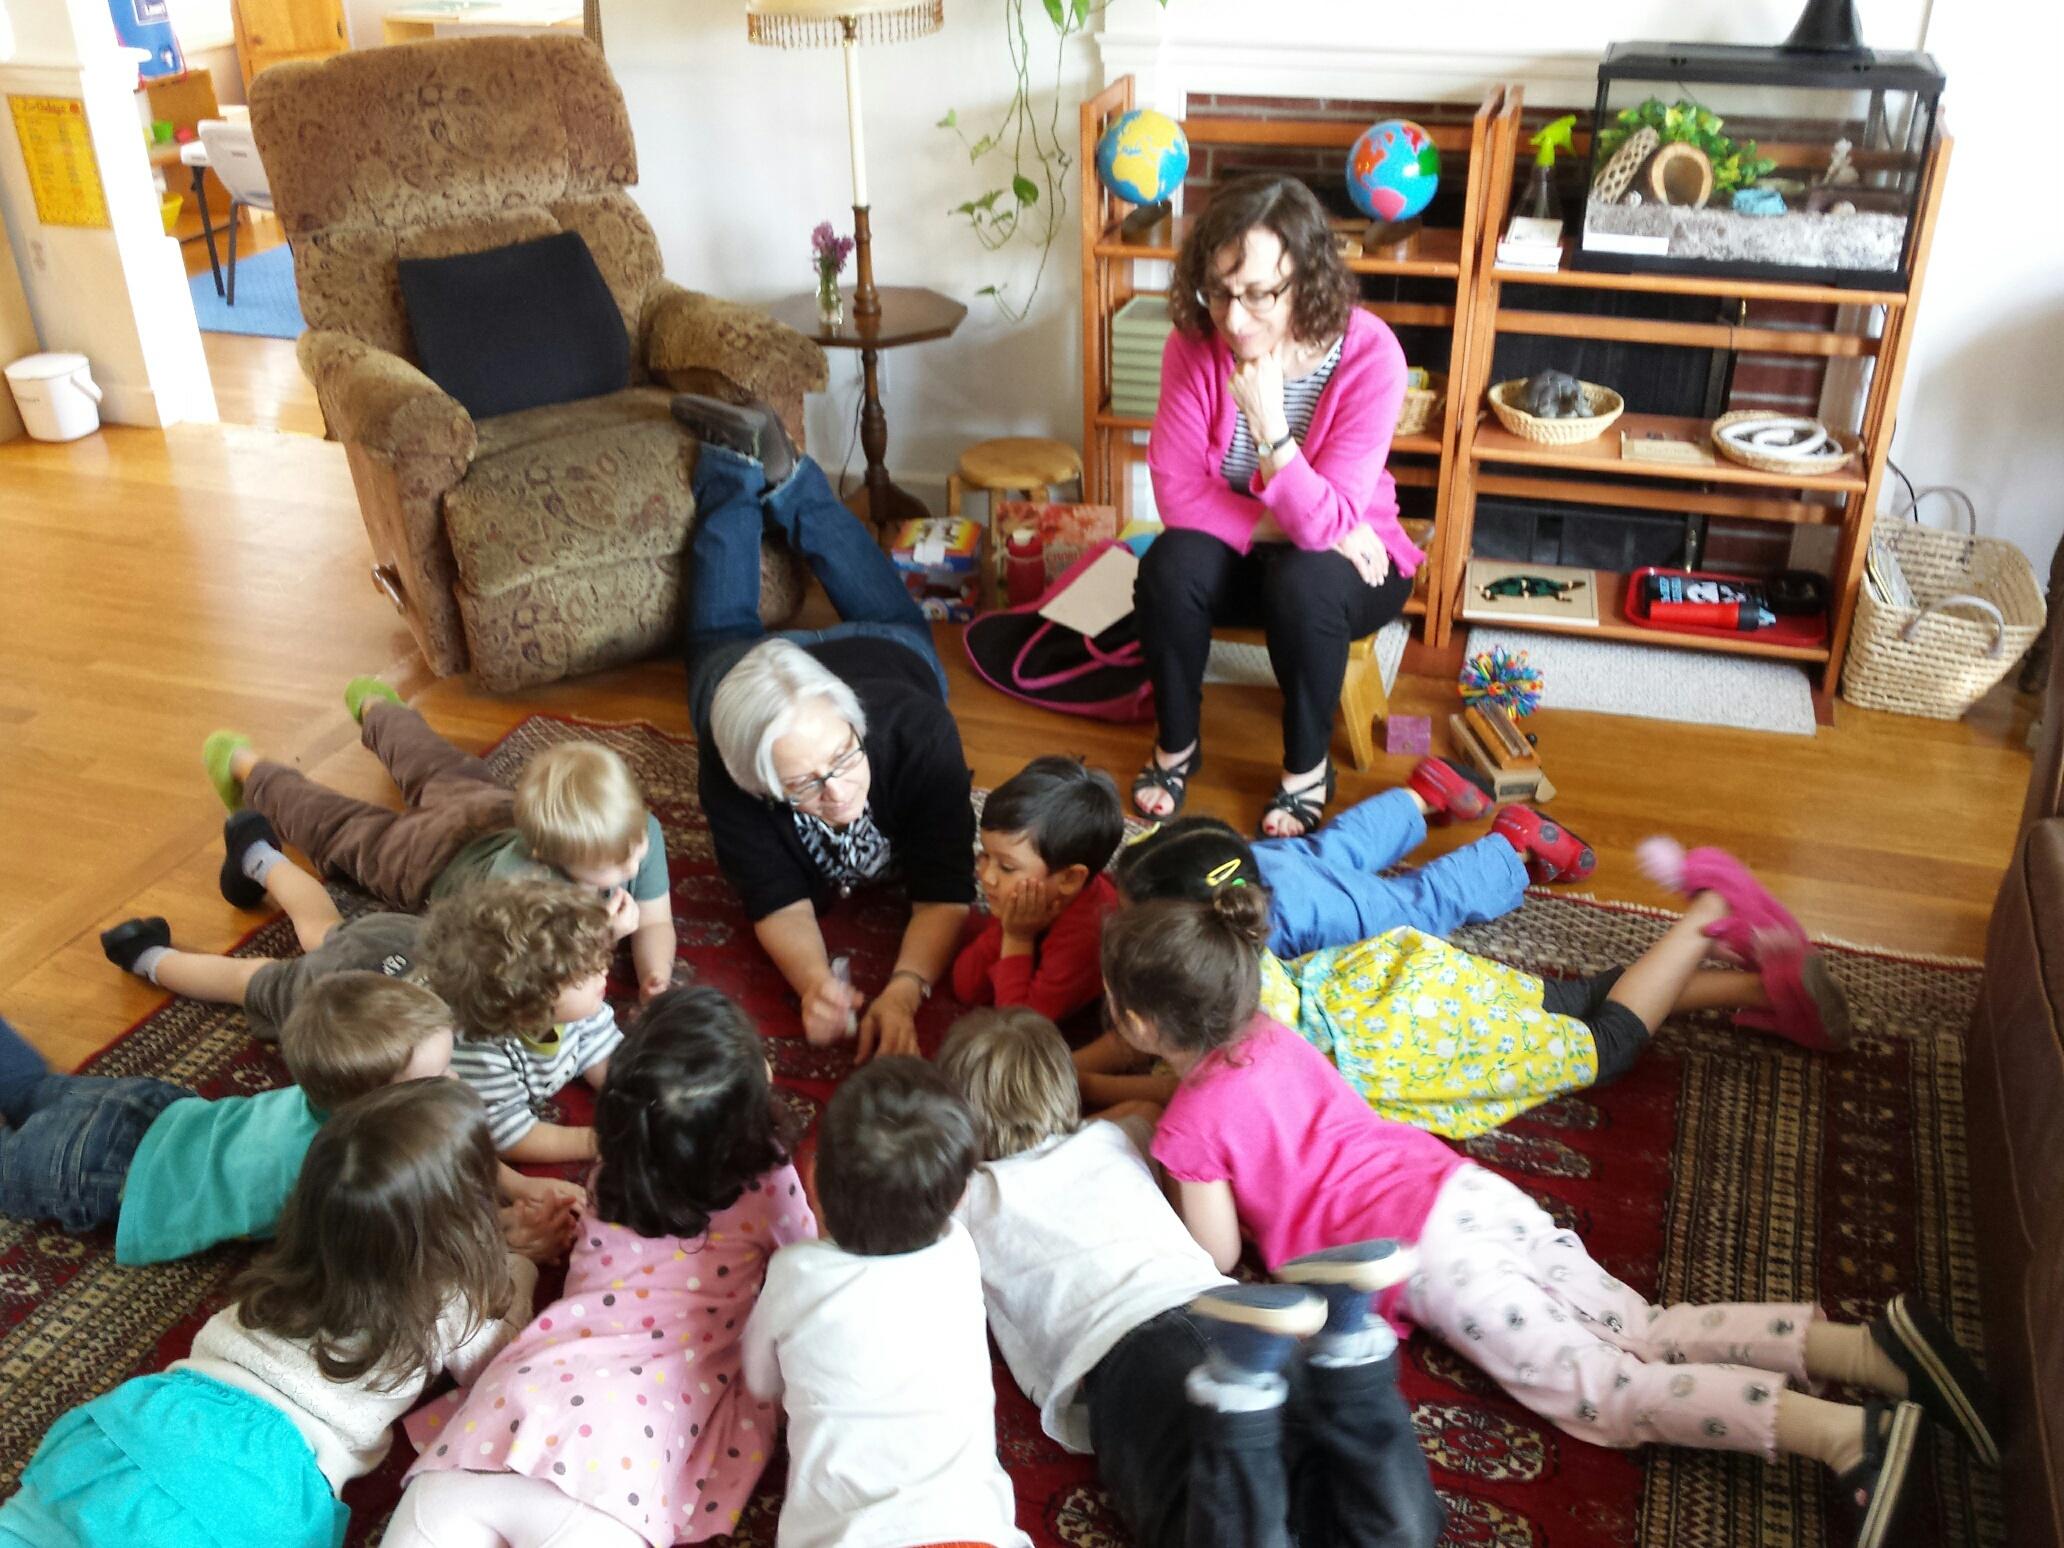 celebrate-picture-books-picture-book-review-interview-with-deborah-sosin-debbie-at-cottage-montessori-school